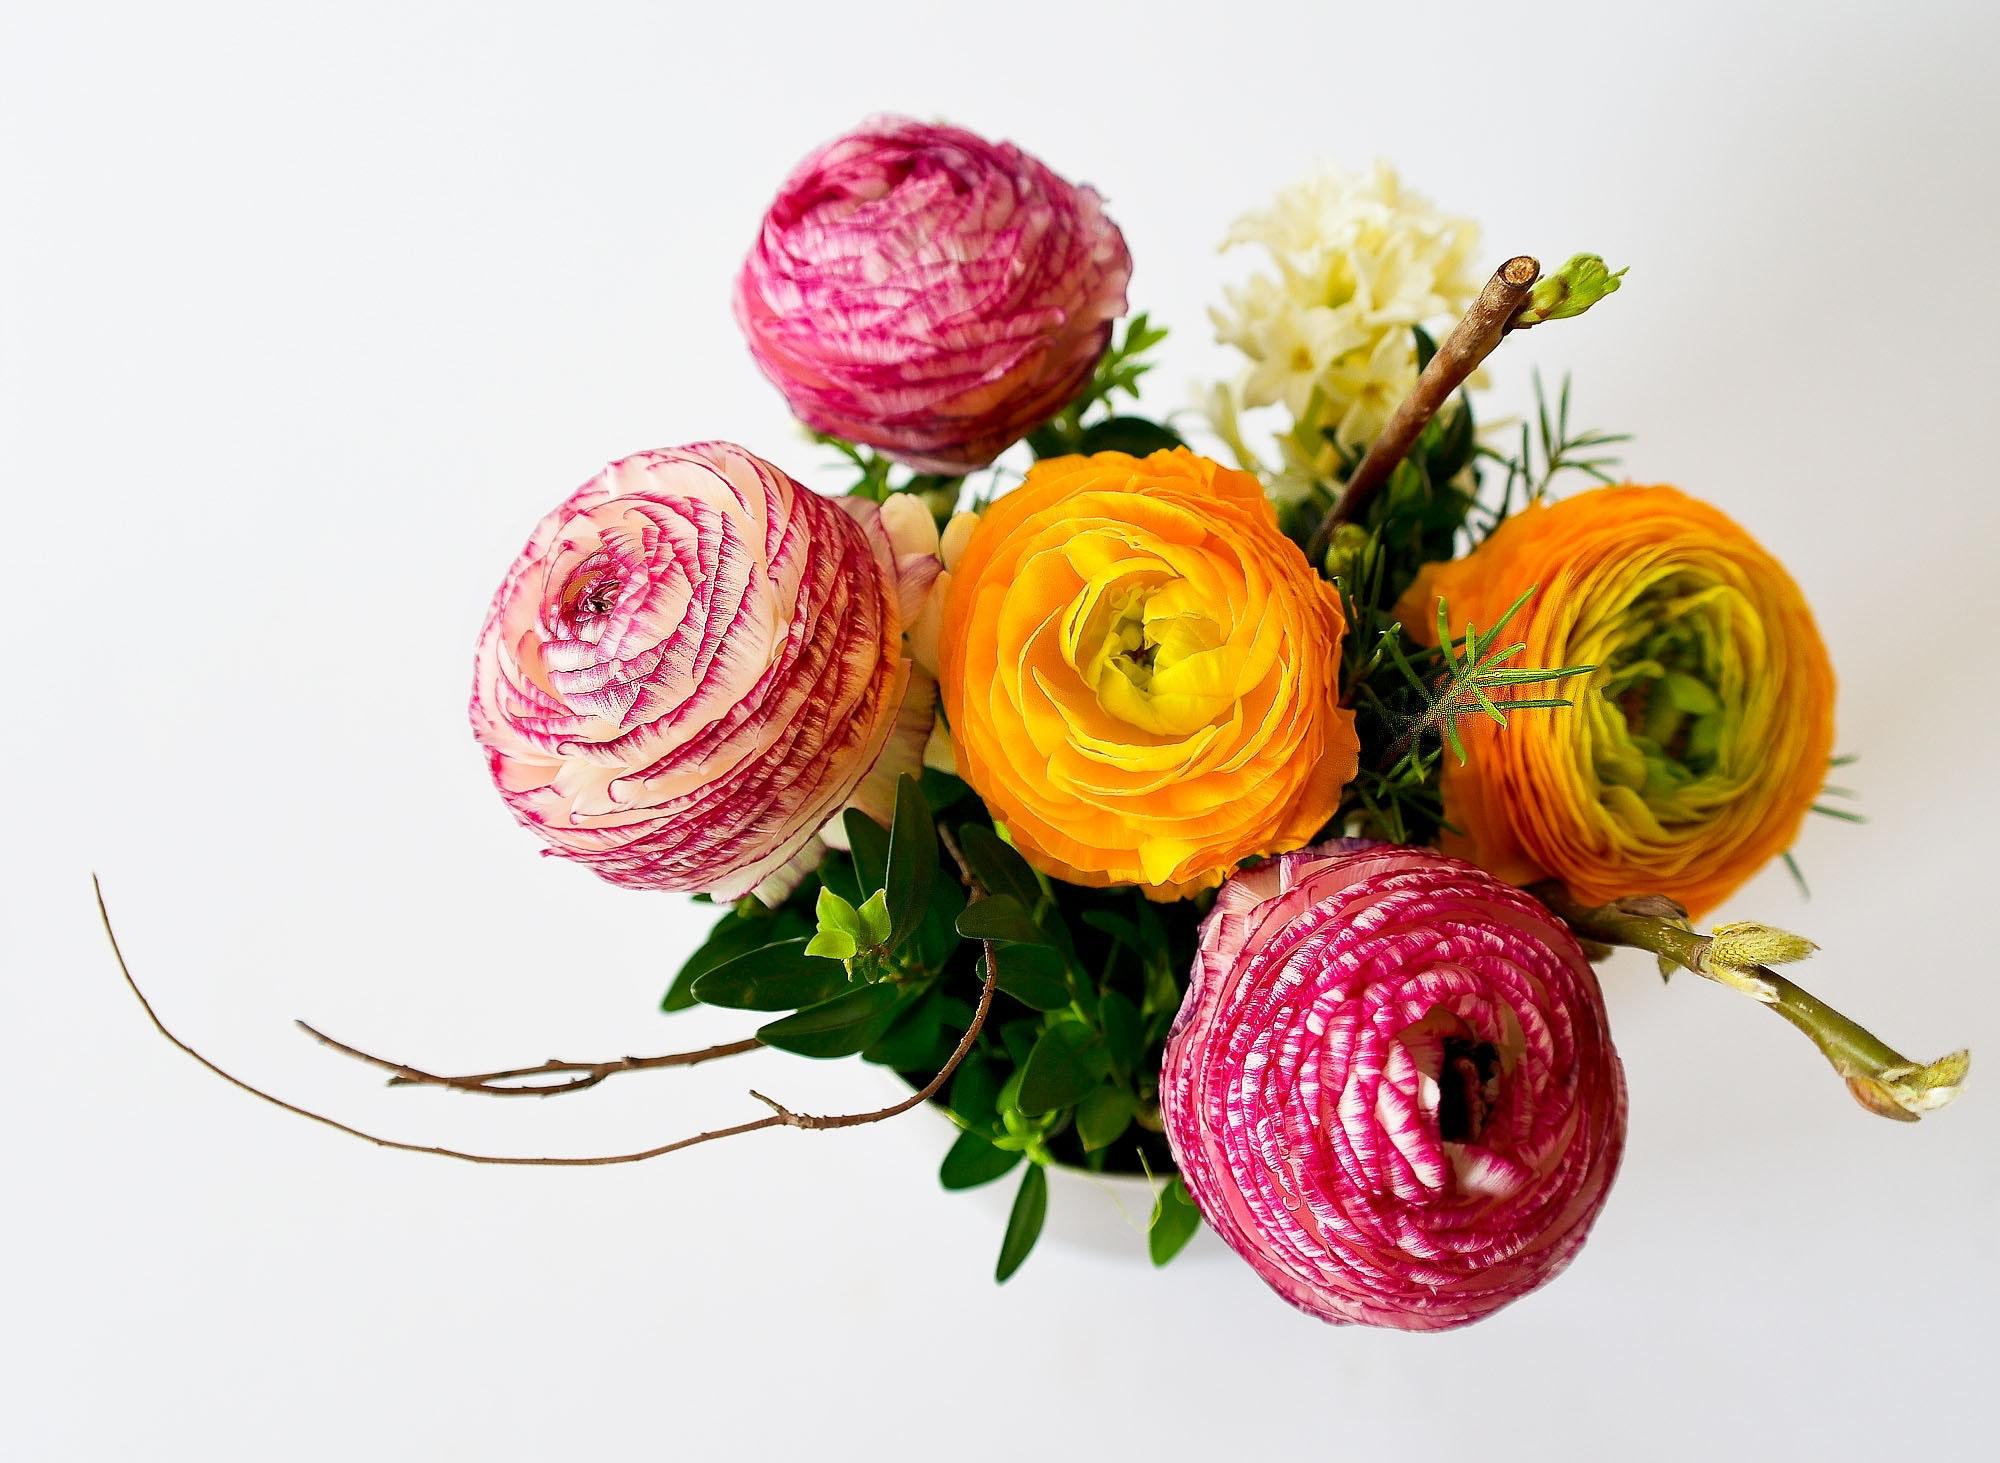 bloom-blossom-bouquet-36473.jpg